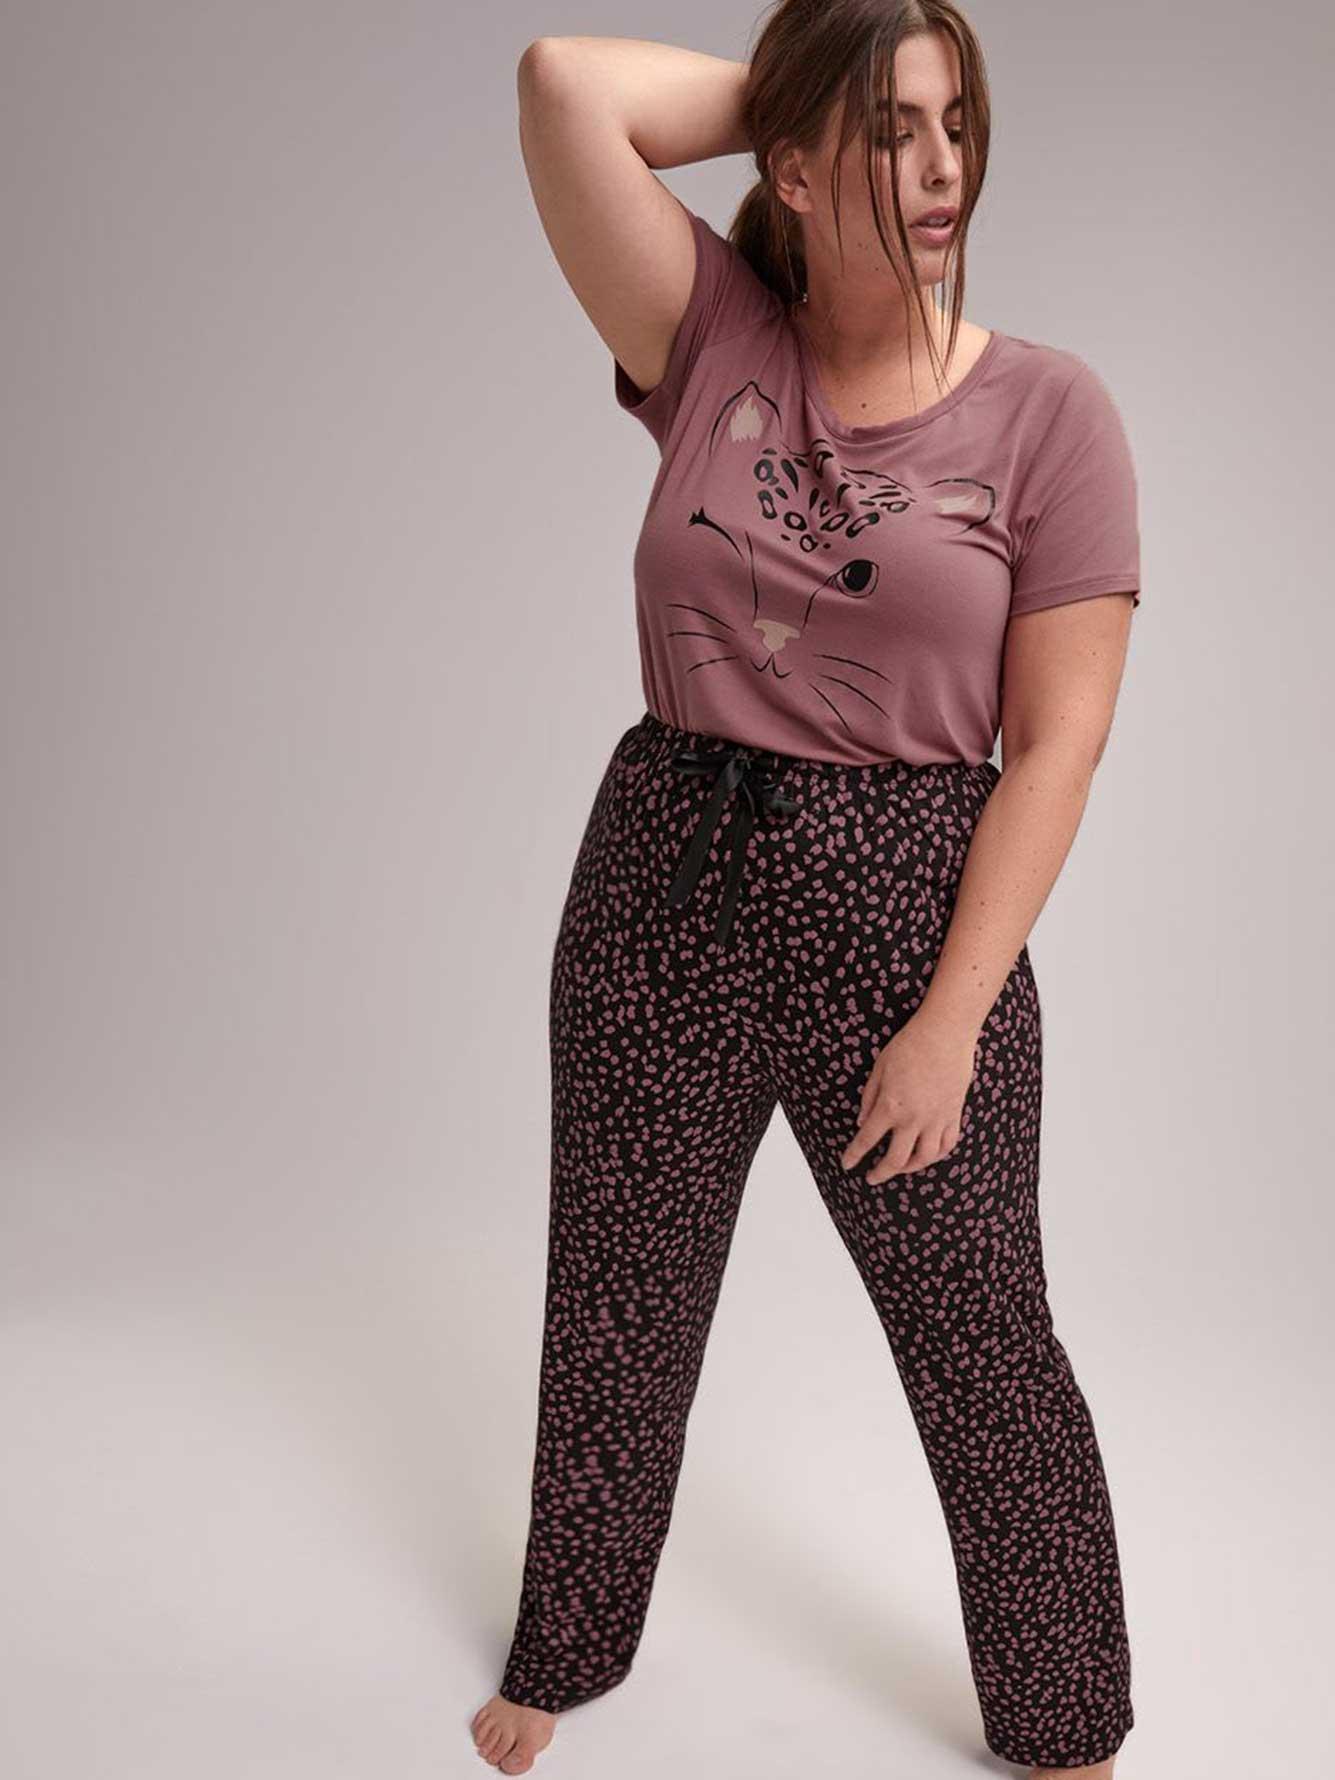 Straight Leg Pajama Pant - Déesse Collection  08126fbee